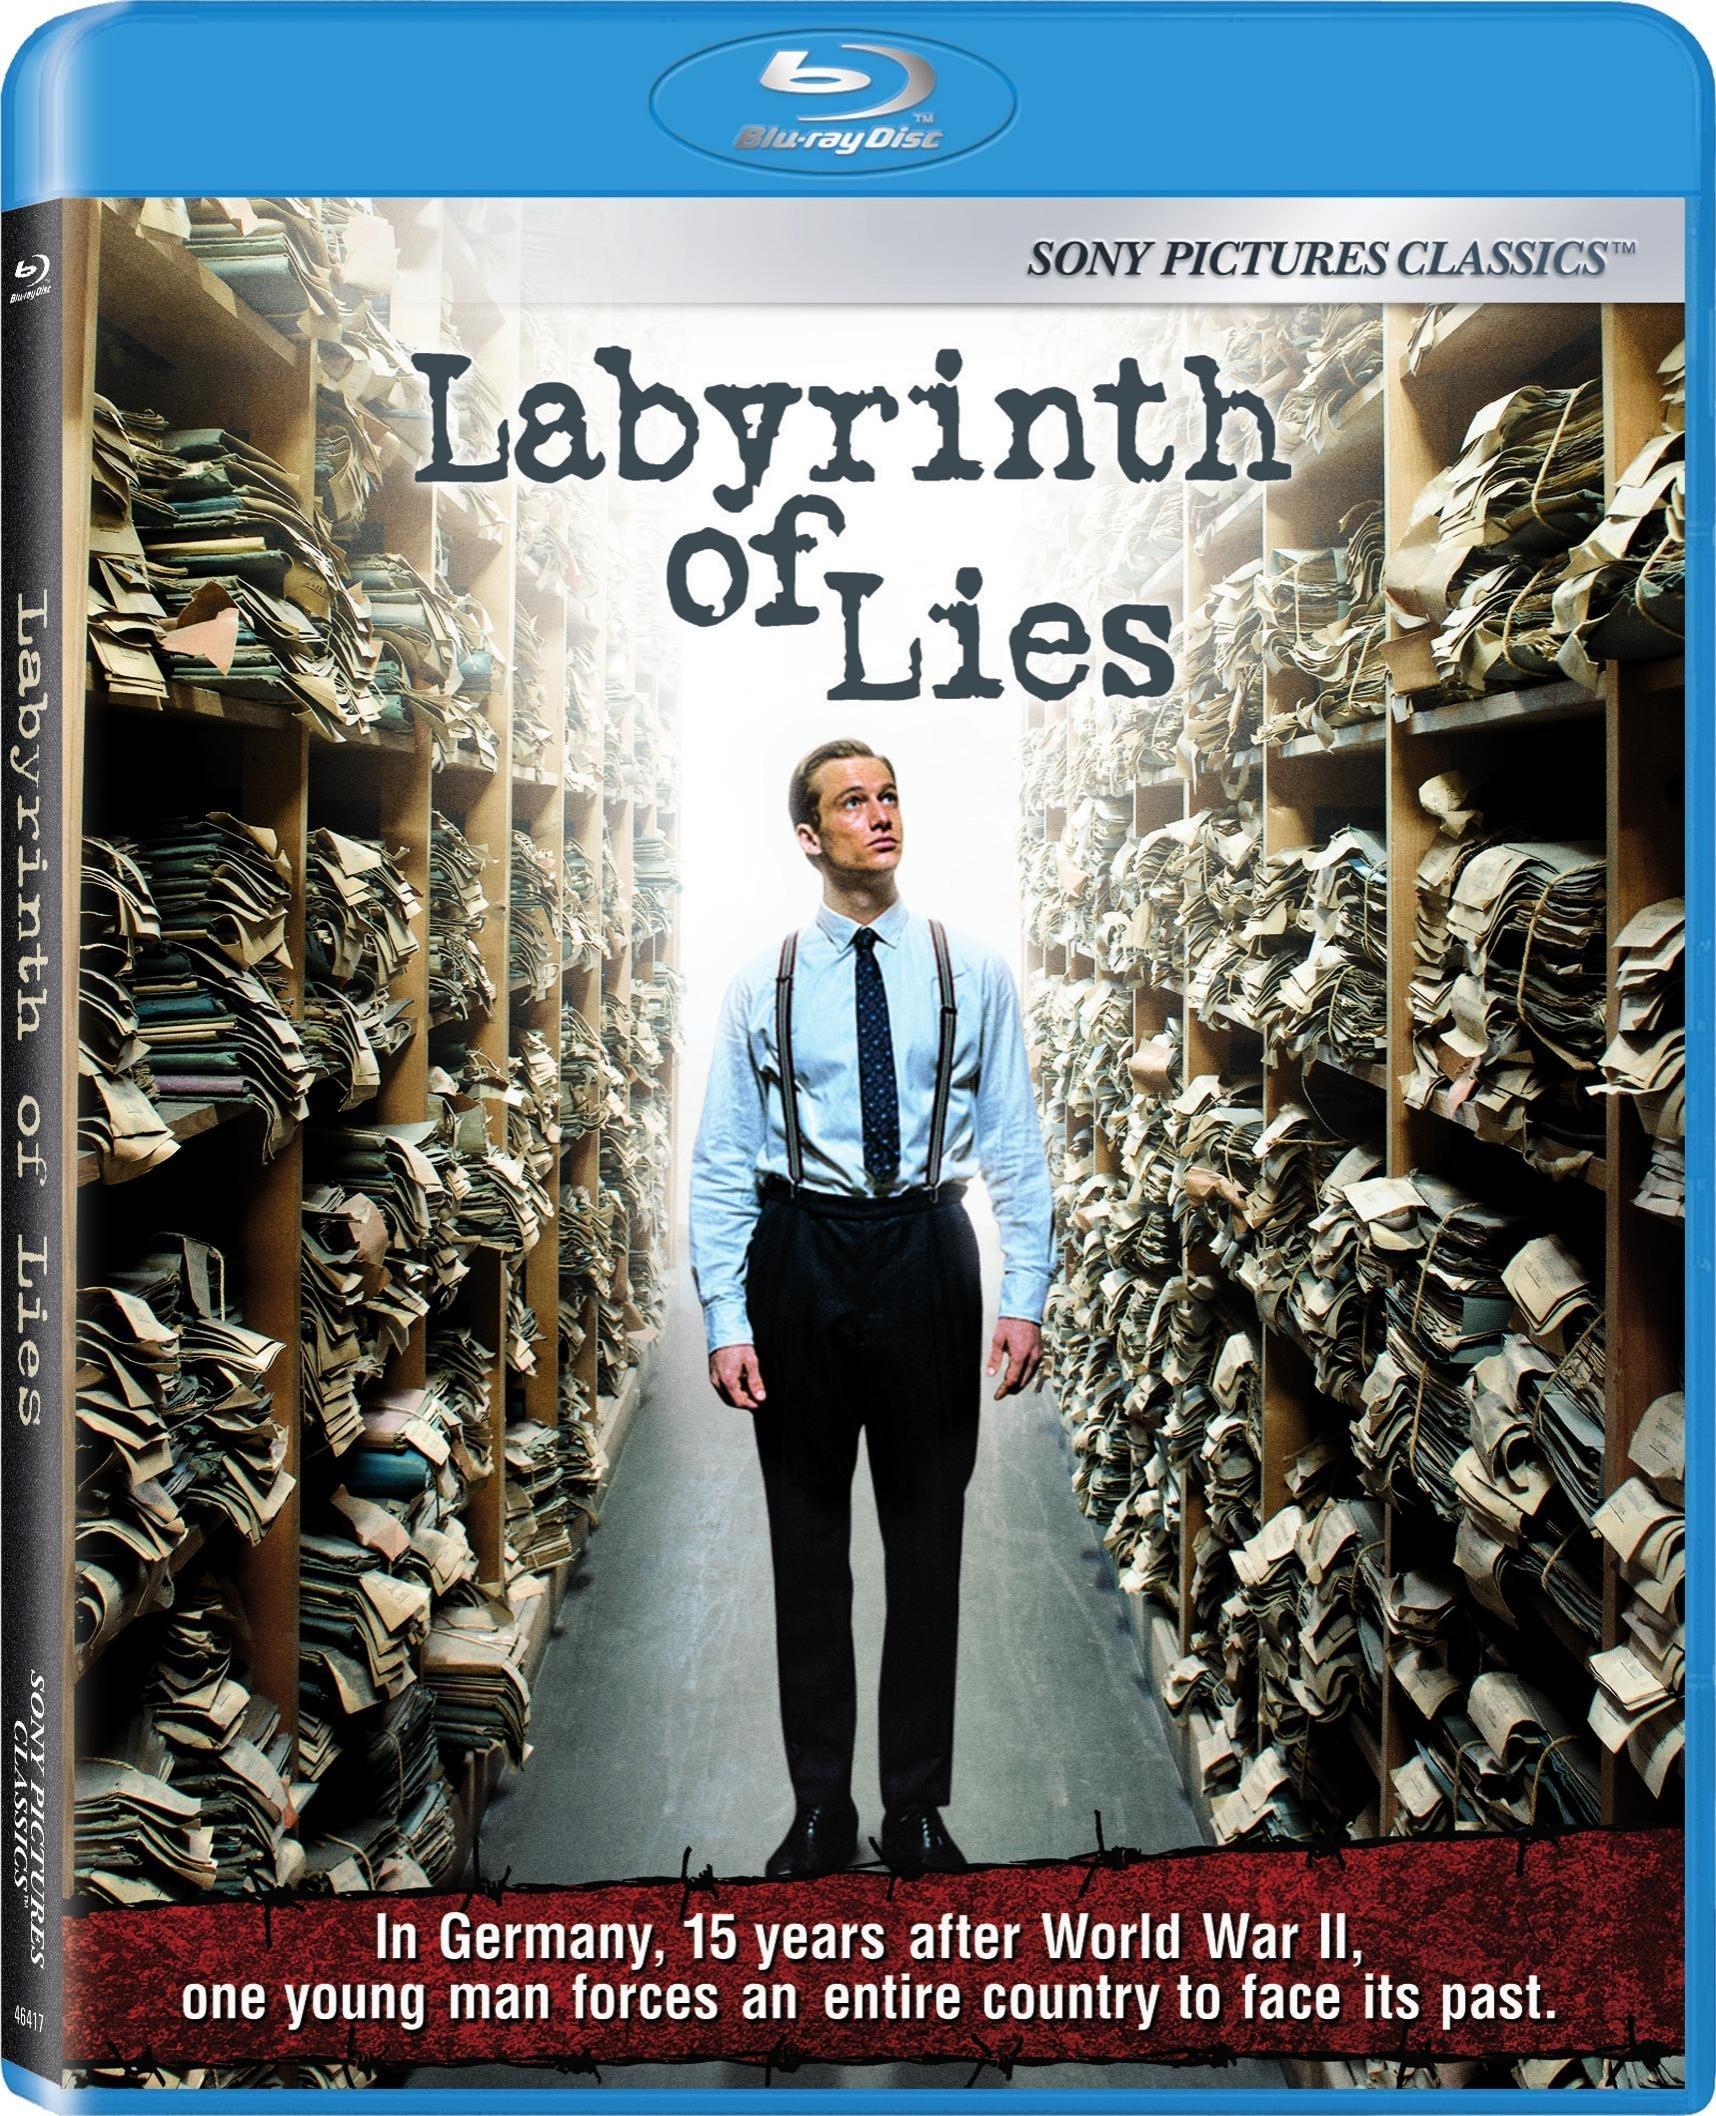 Labyrinth of Lies (2014) Blu-ray